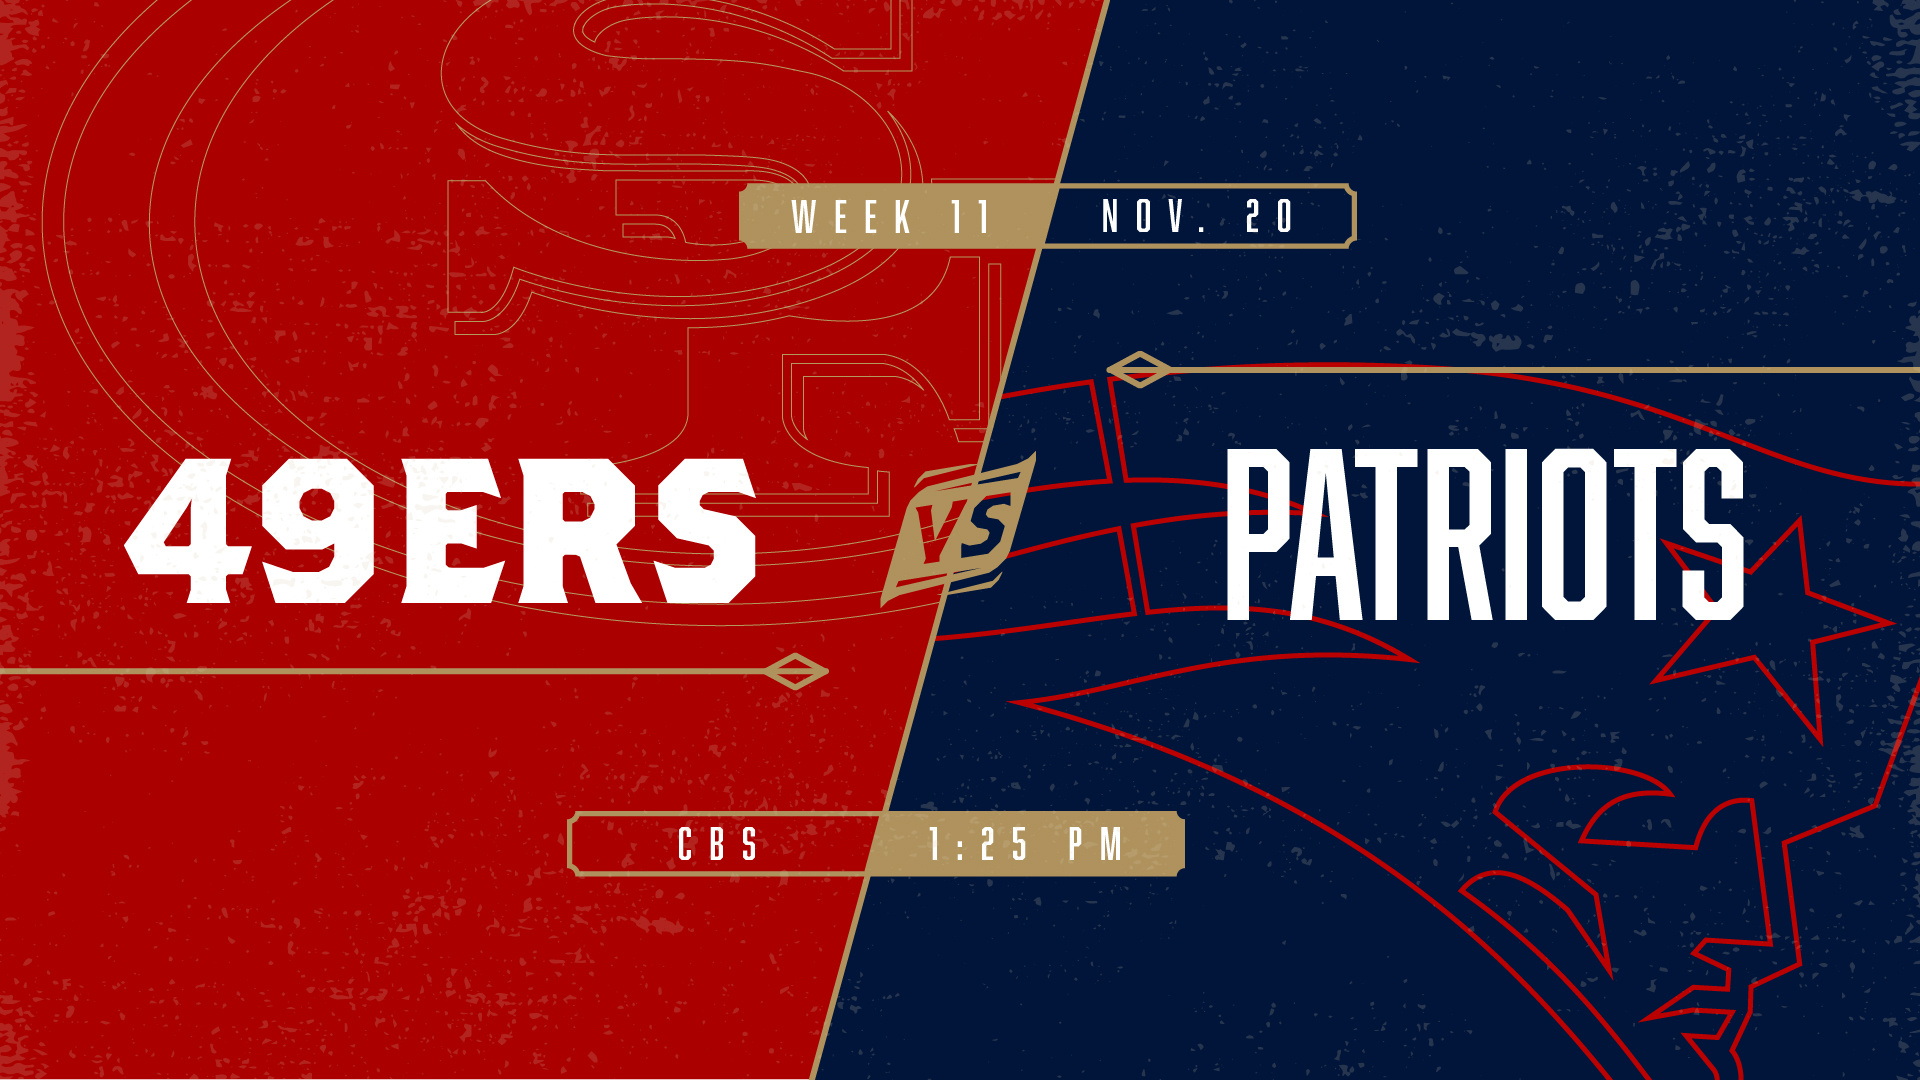 49ers Vs Patriots Levis Stadium